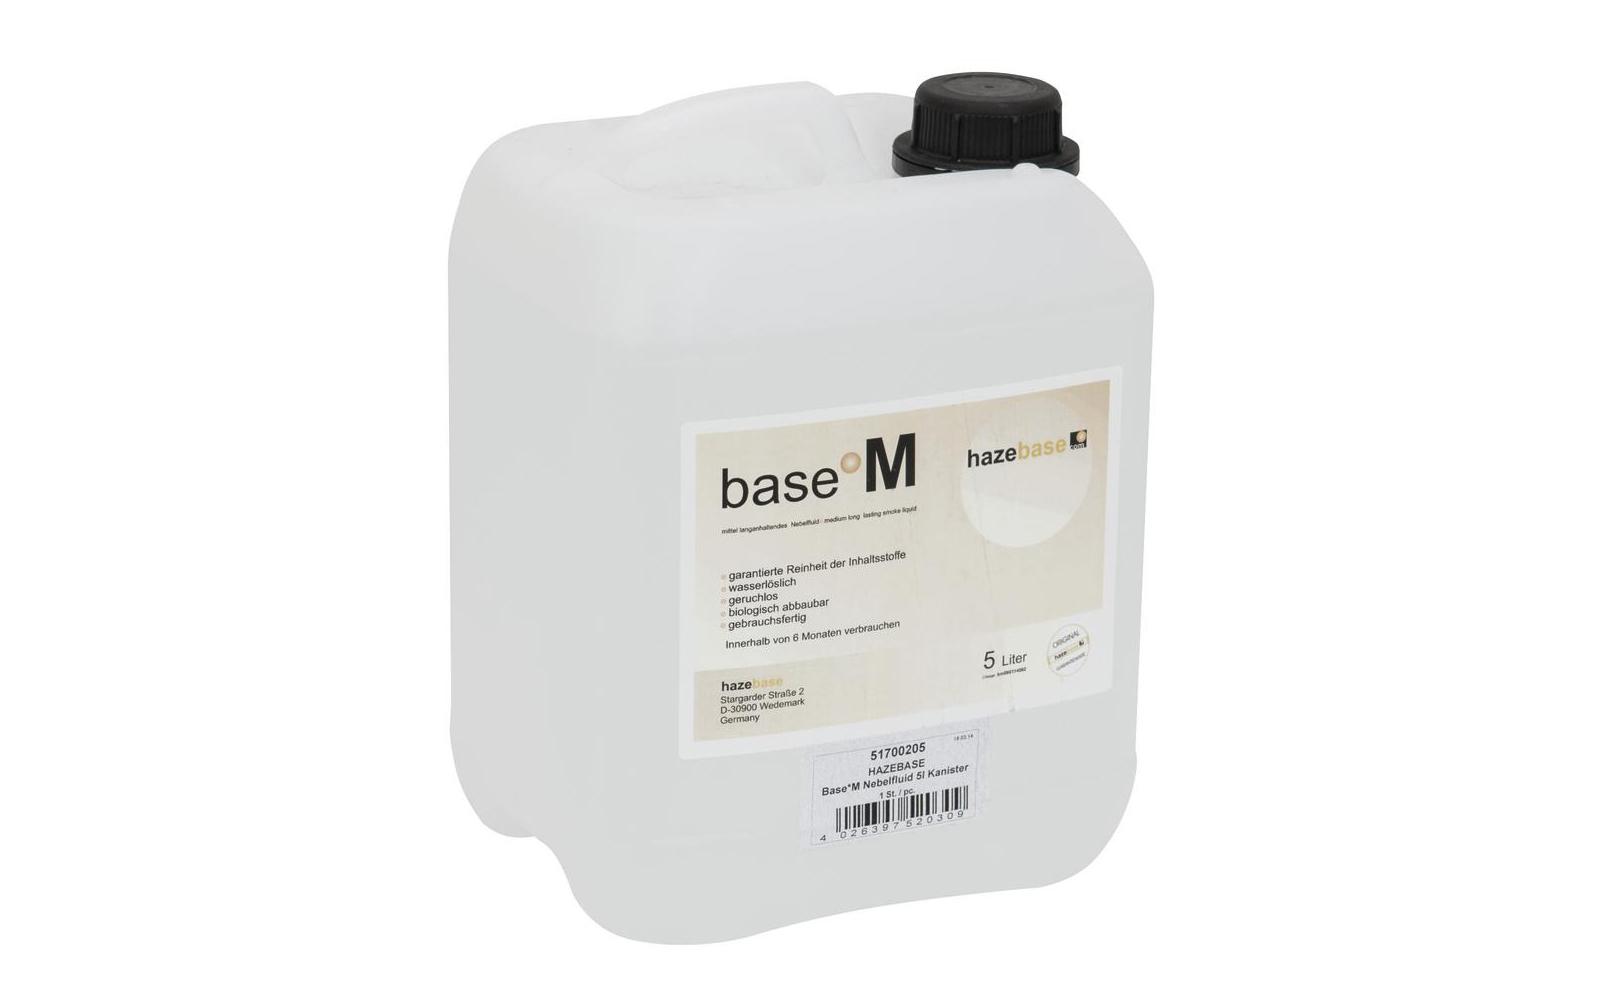 hazebase-base-m-nebelfluid-25l-kanister